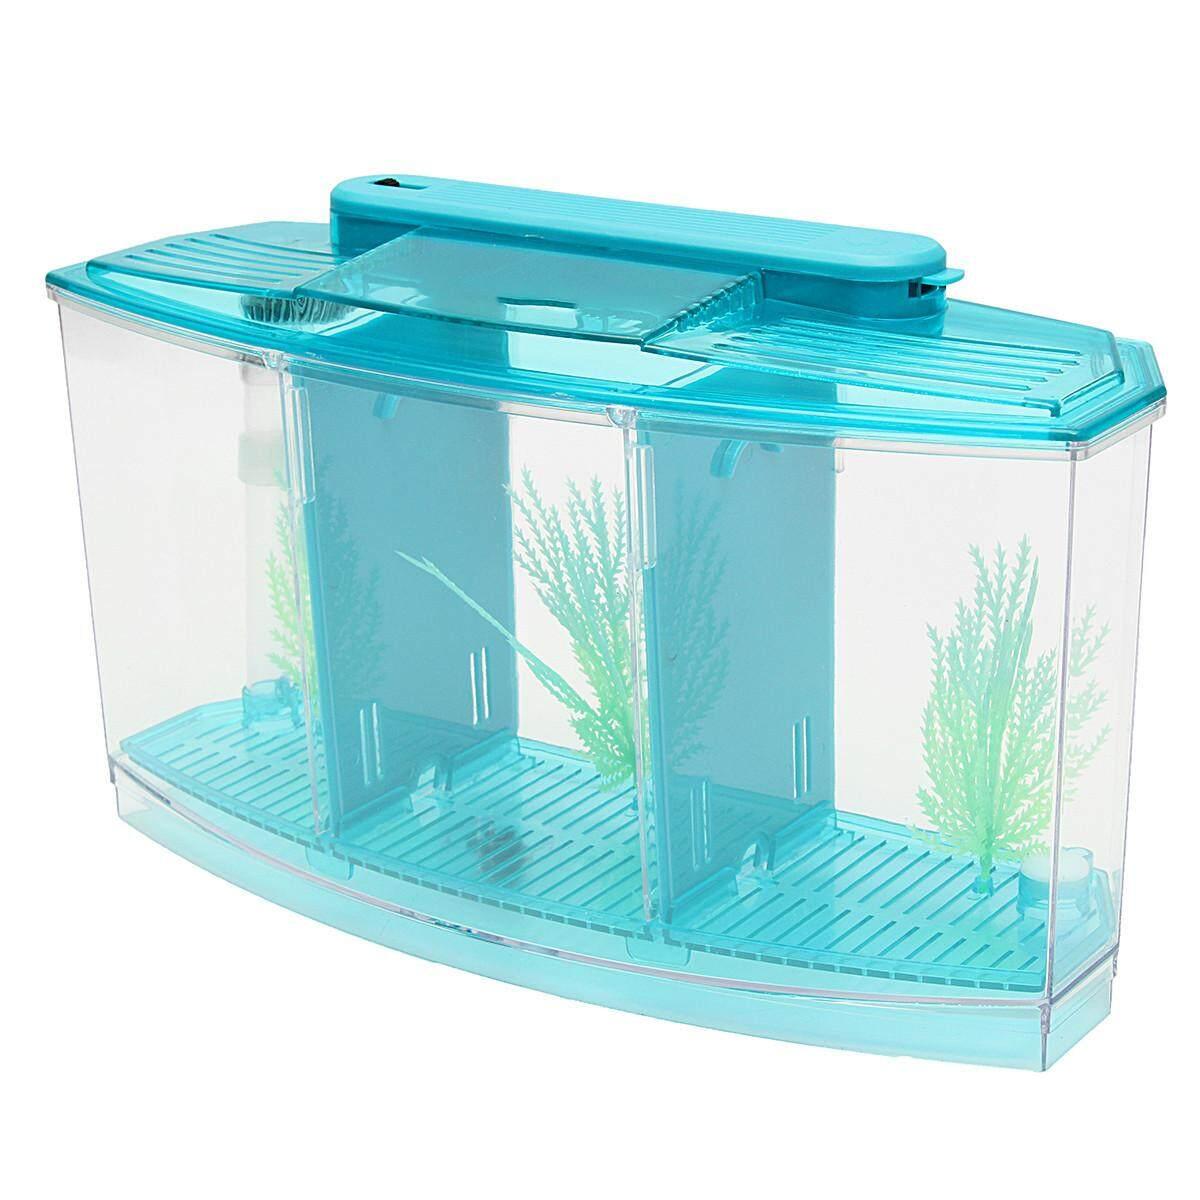 Sale New Triple Cube Led Light Betta Aquarium Separate Spawning Box Fish Tank 7Gel Blue Intl